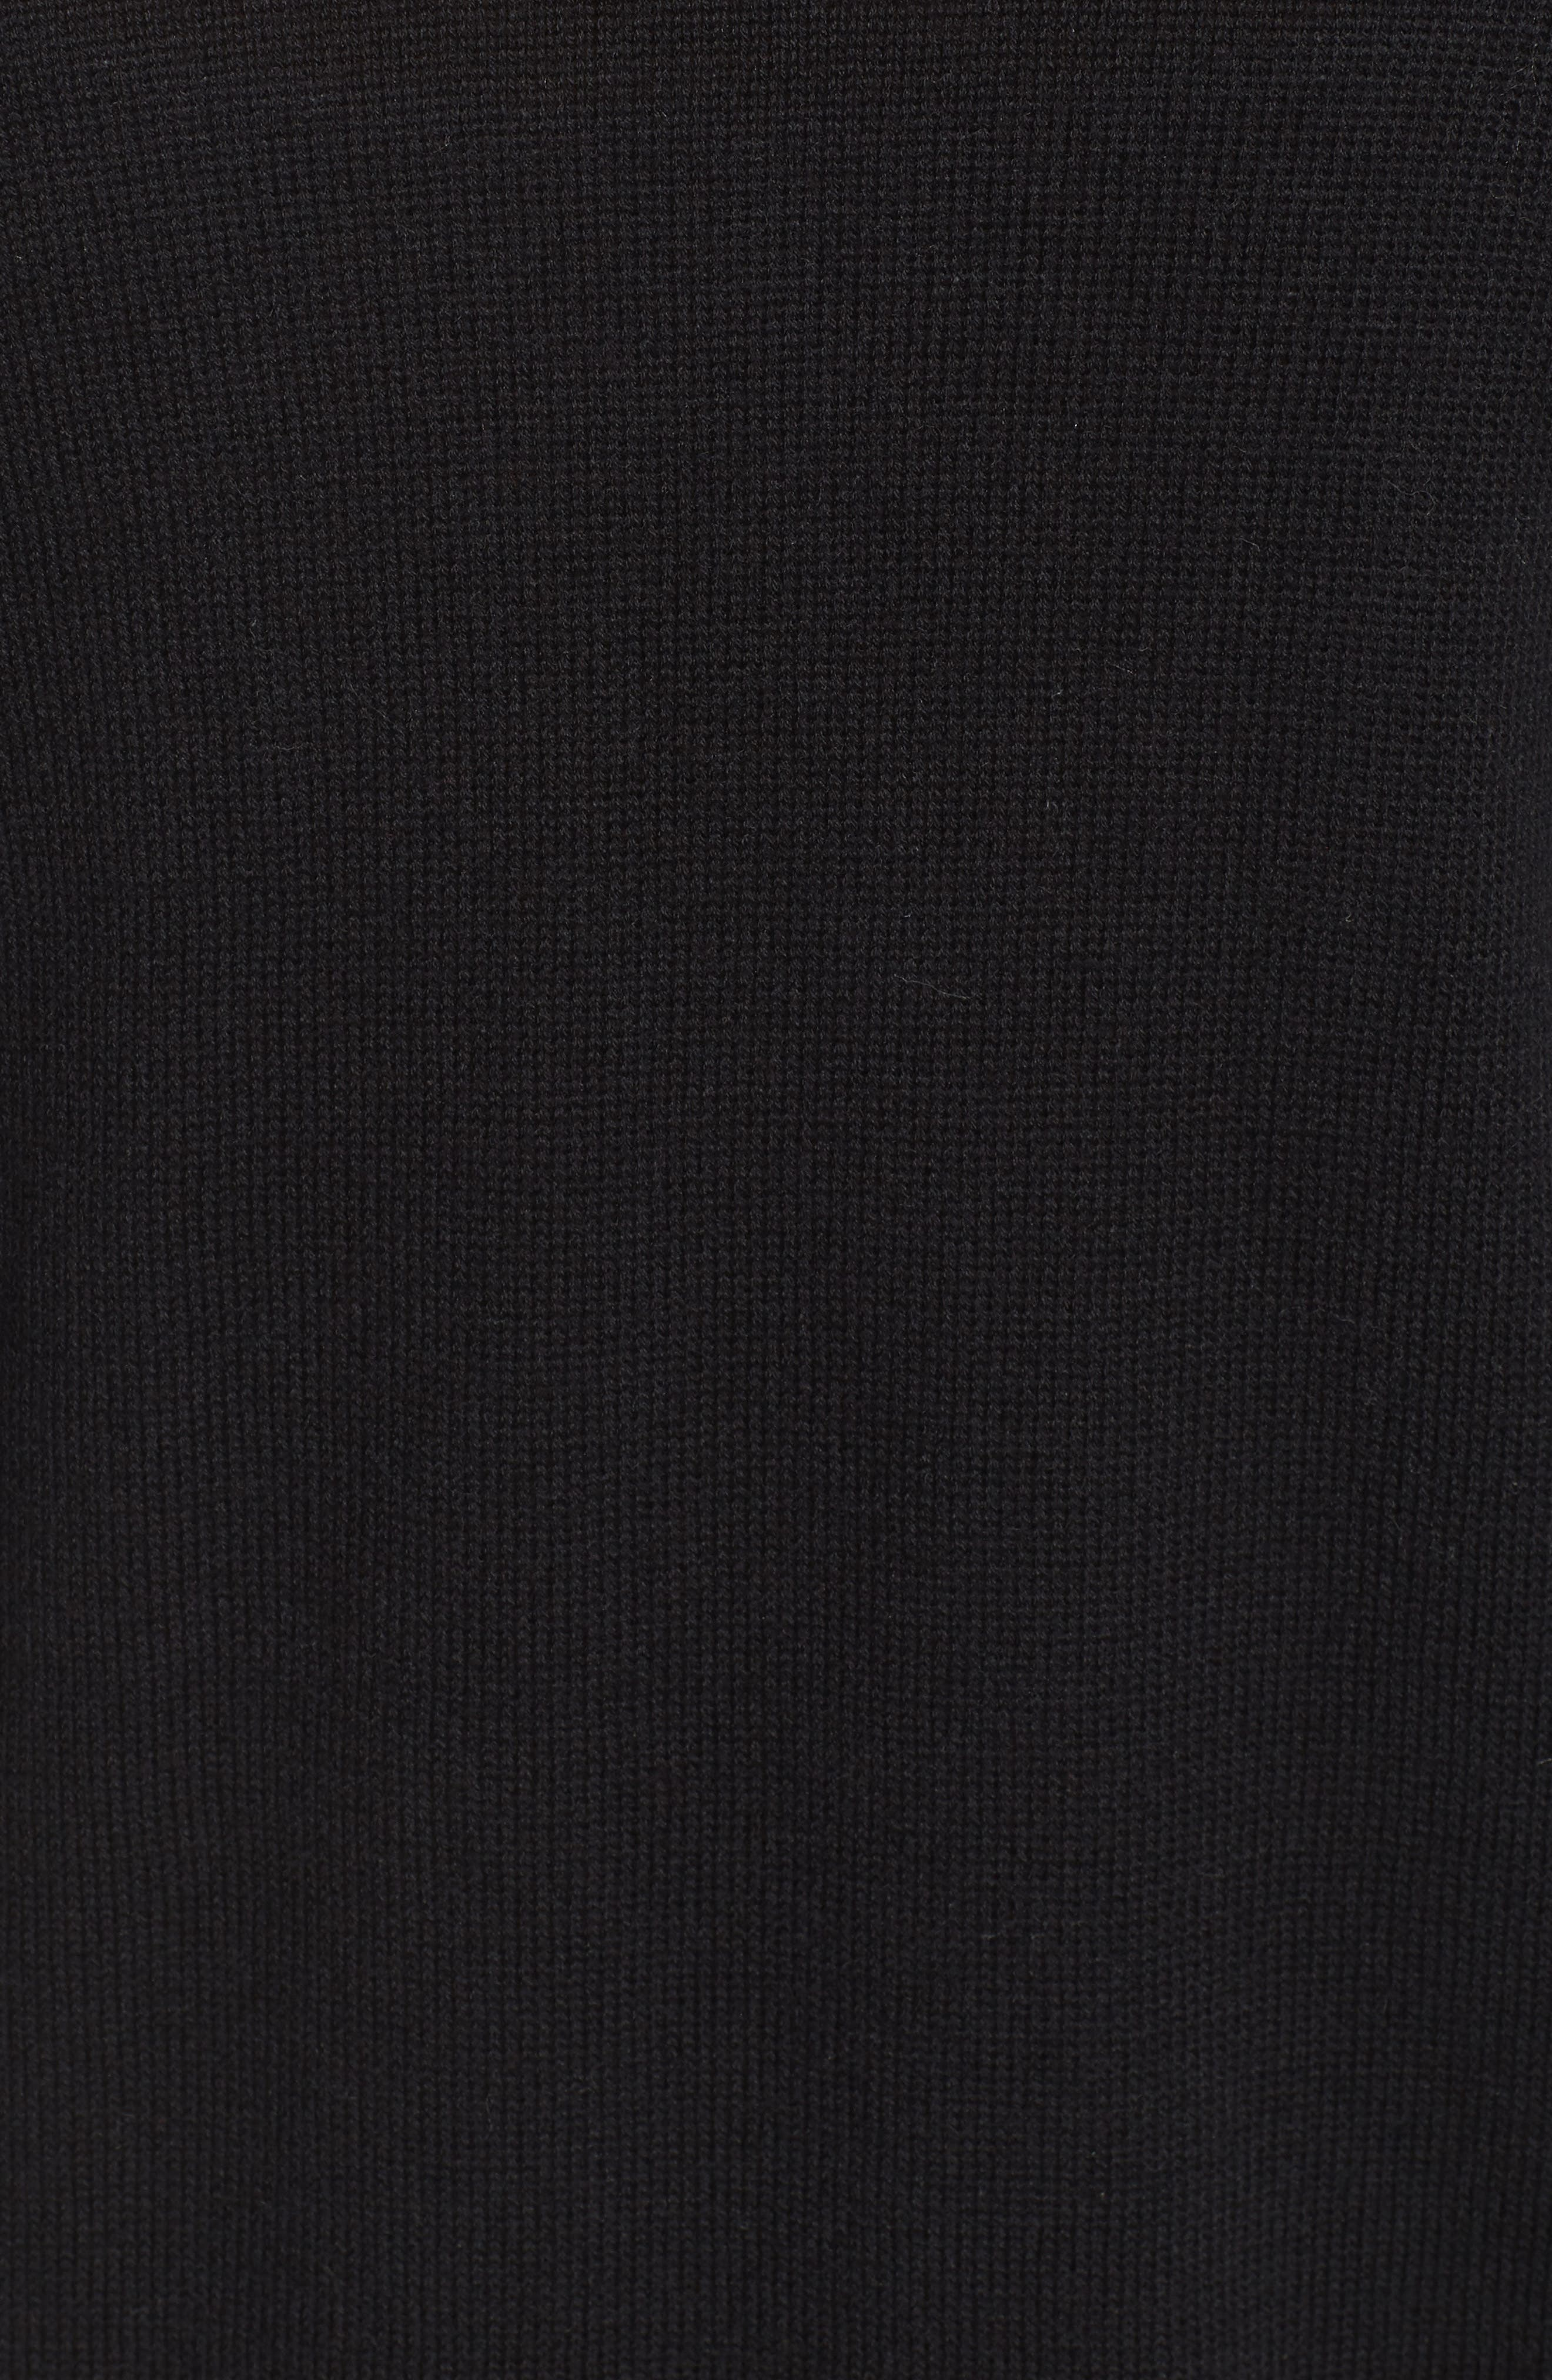 Ruffle Sleeve Cardigan,                             Alternate thumbnail 5, color,                             Black